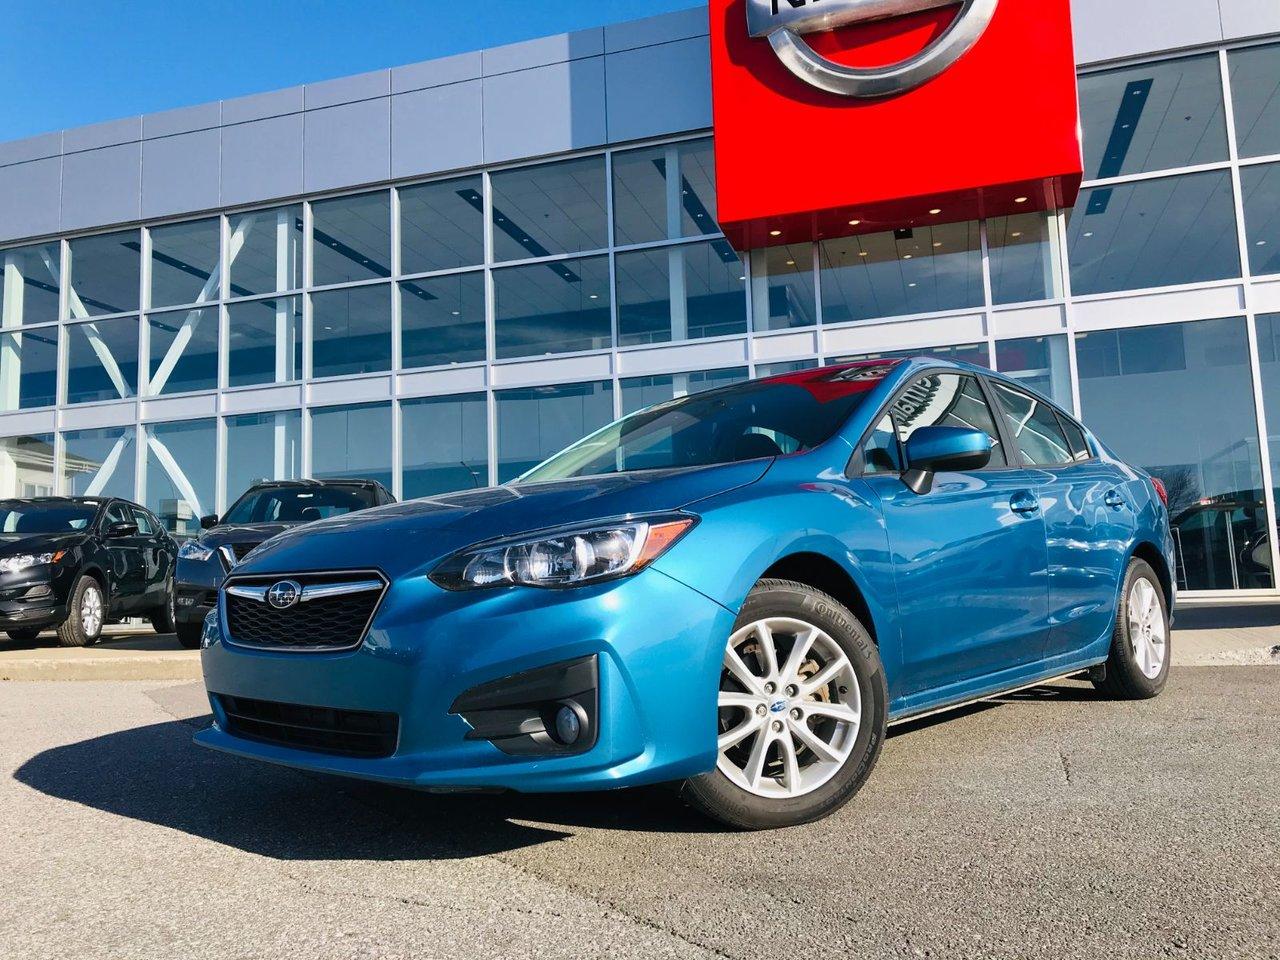 2018 Subaru  Impreza TOURING **GARANTIE 18 JUIN 2025 ou 140 000 KM